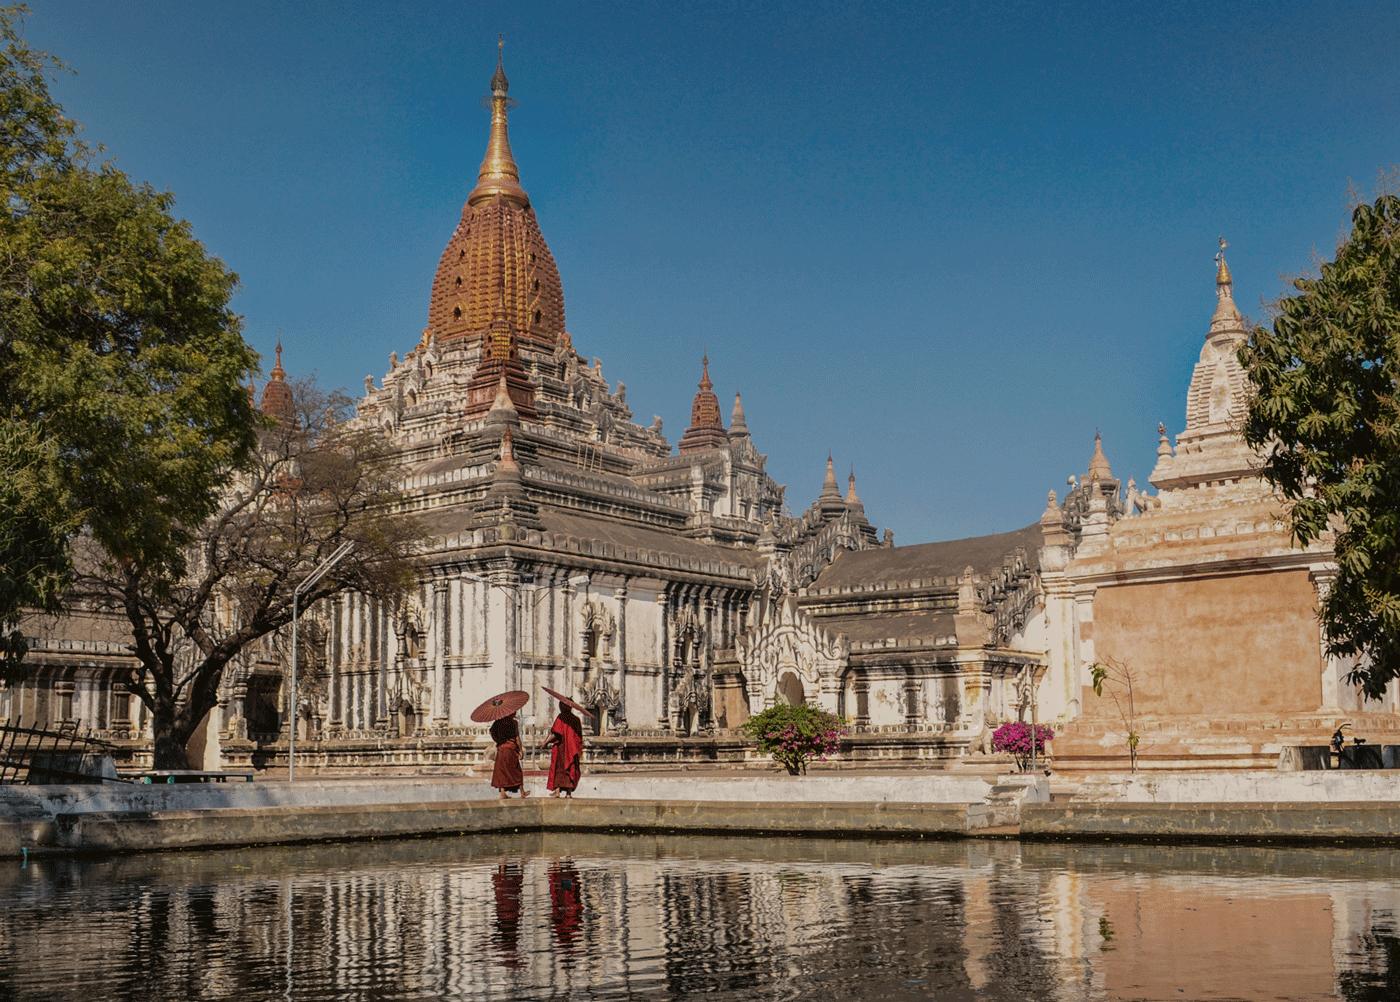 Photo Cr : Belmond Road to Mandalay  Ananda Temple - Bagan